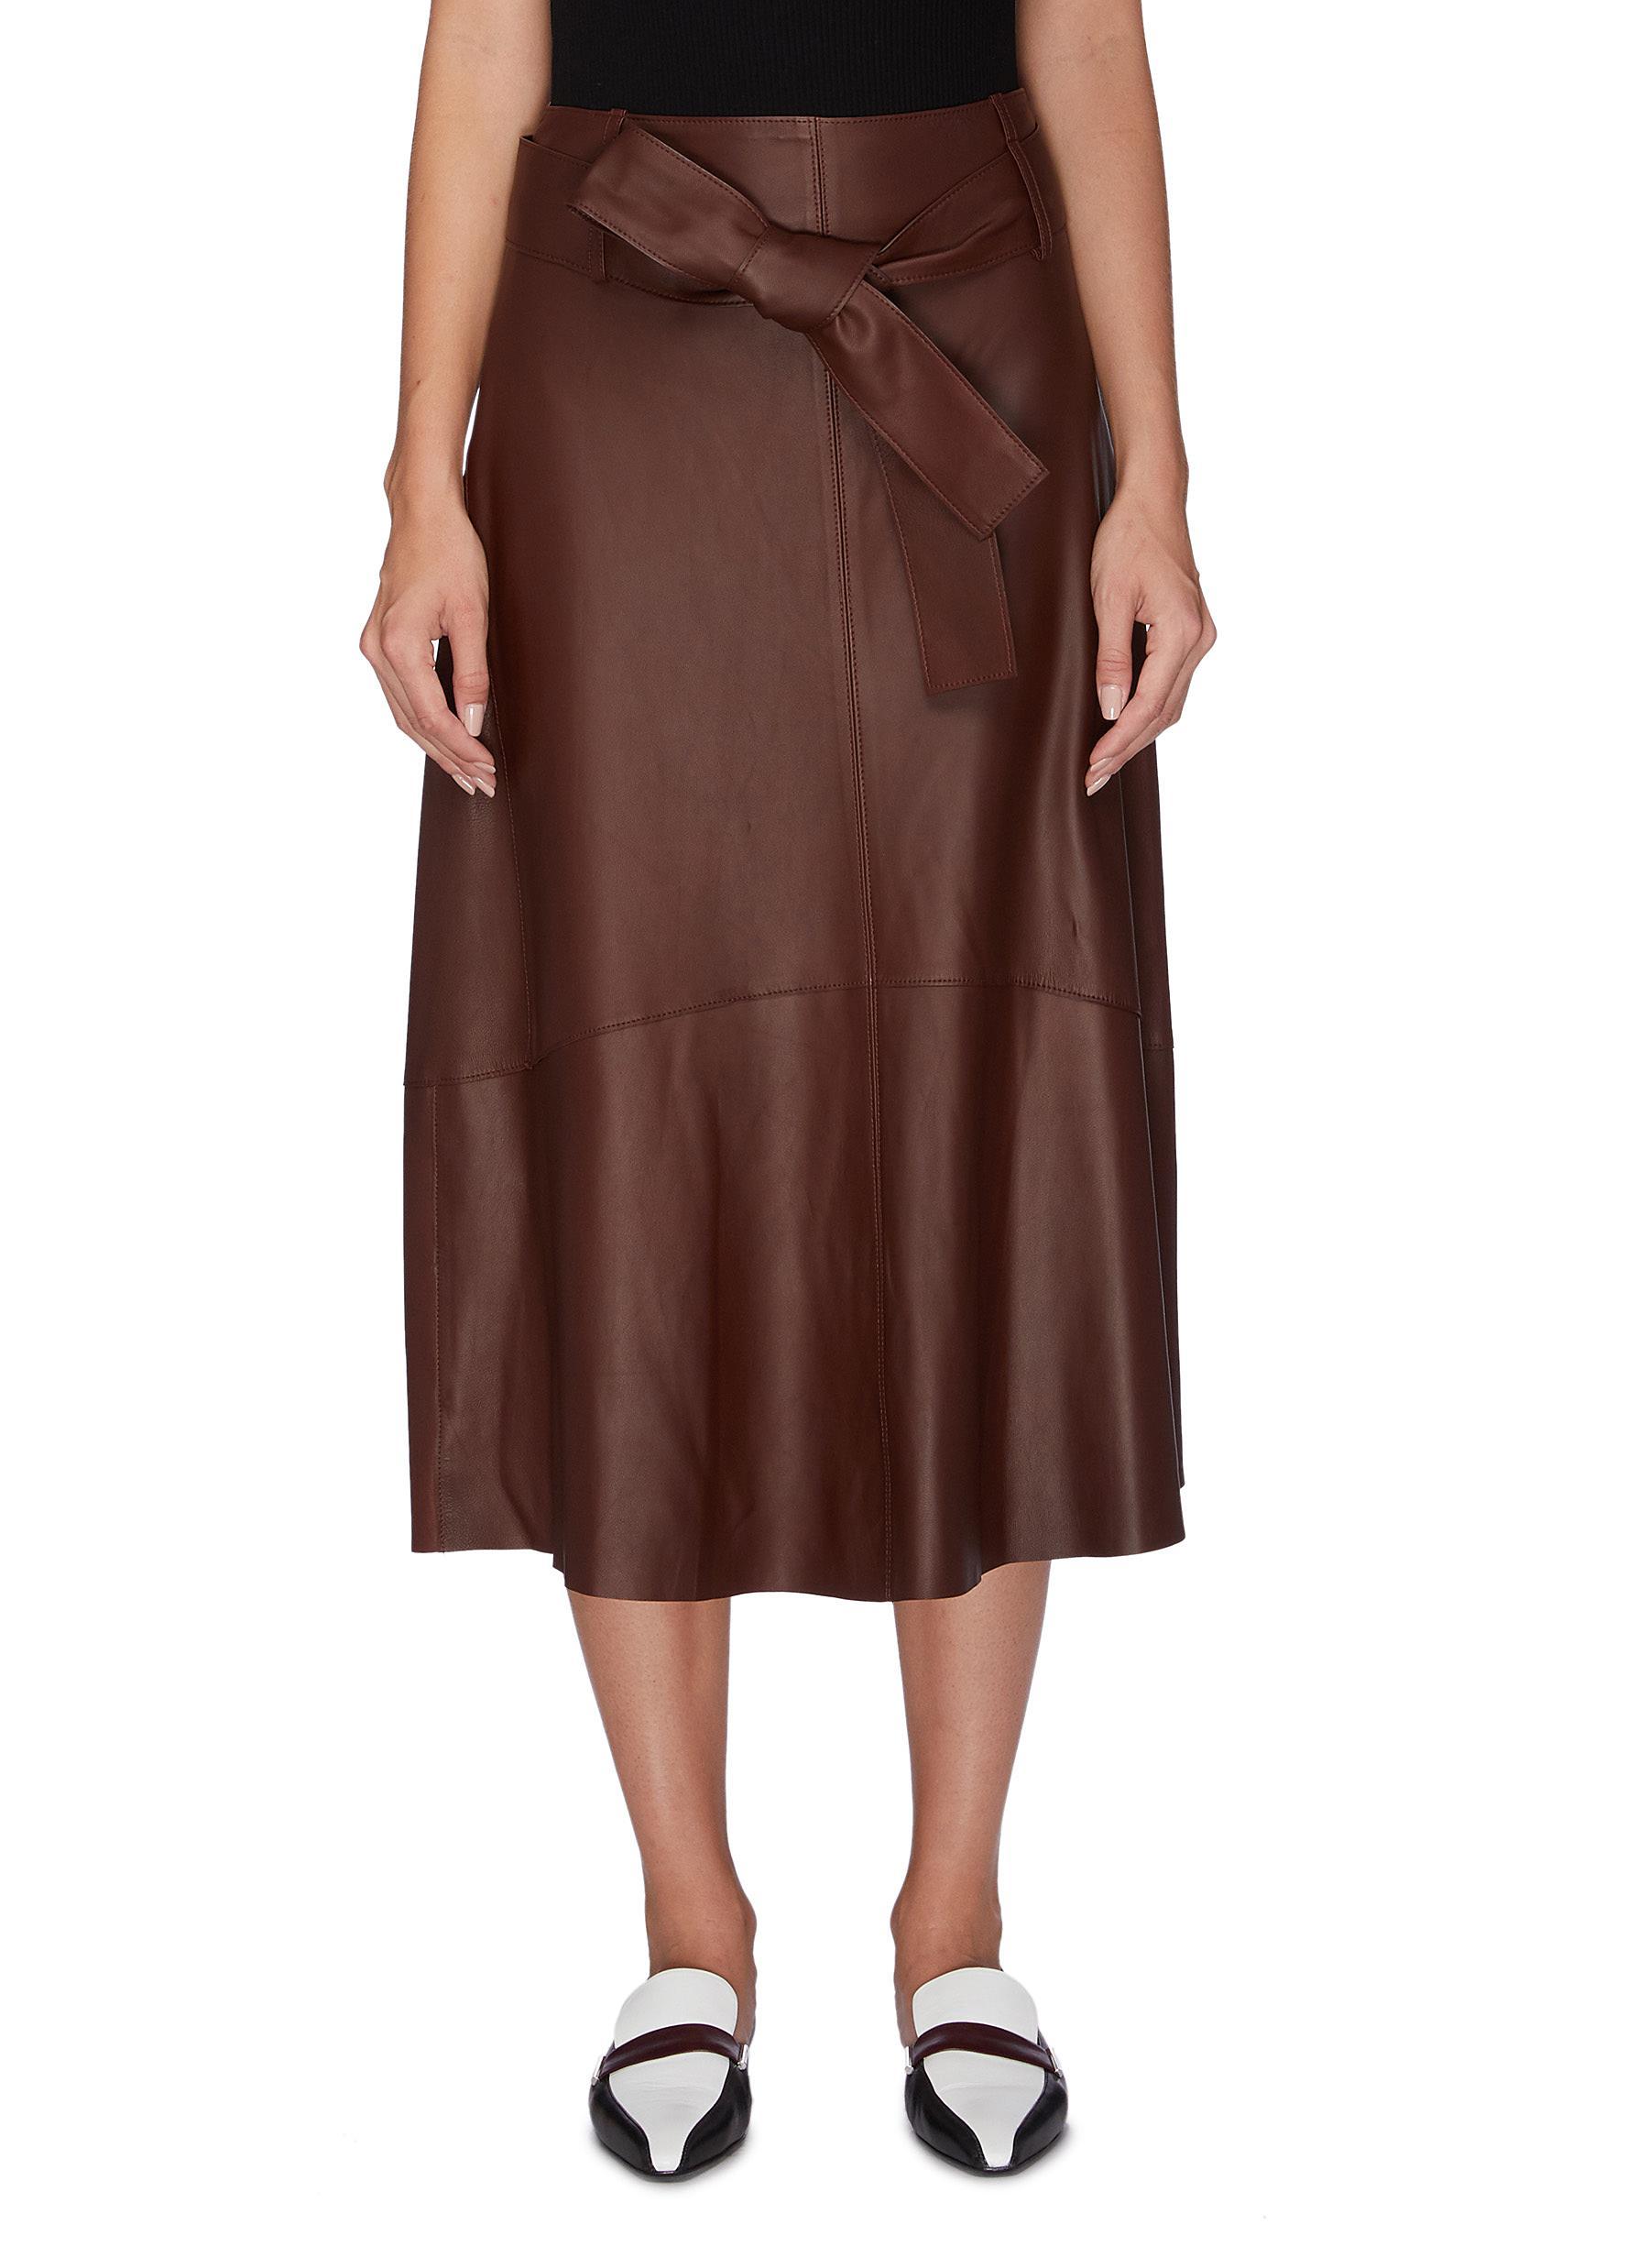 Sash tie lambskin leather midi skirt by Vince